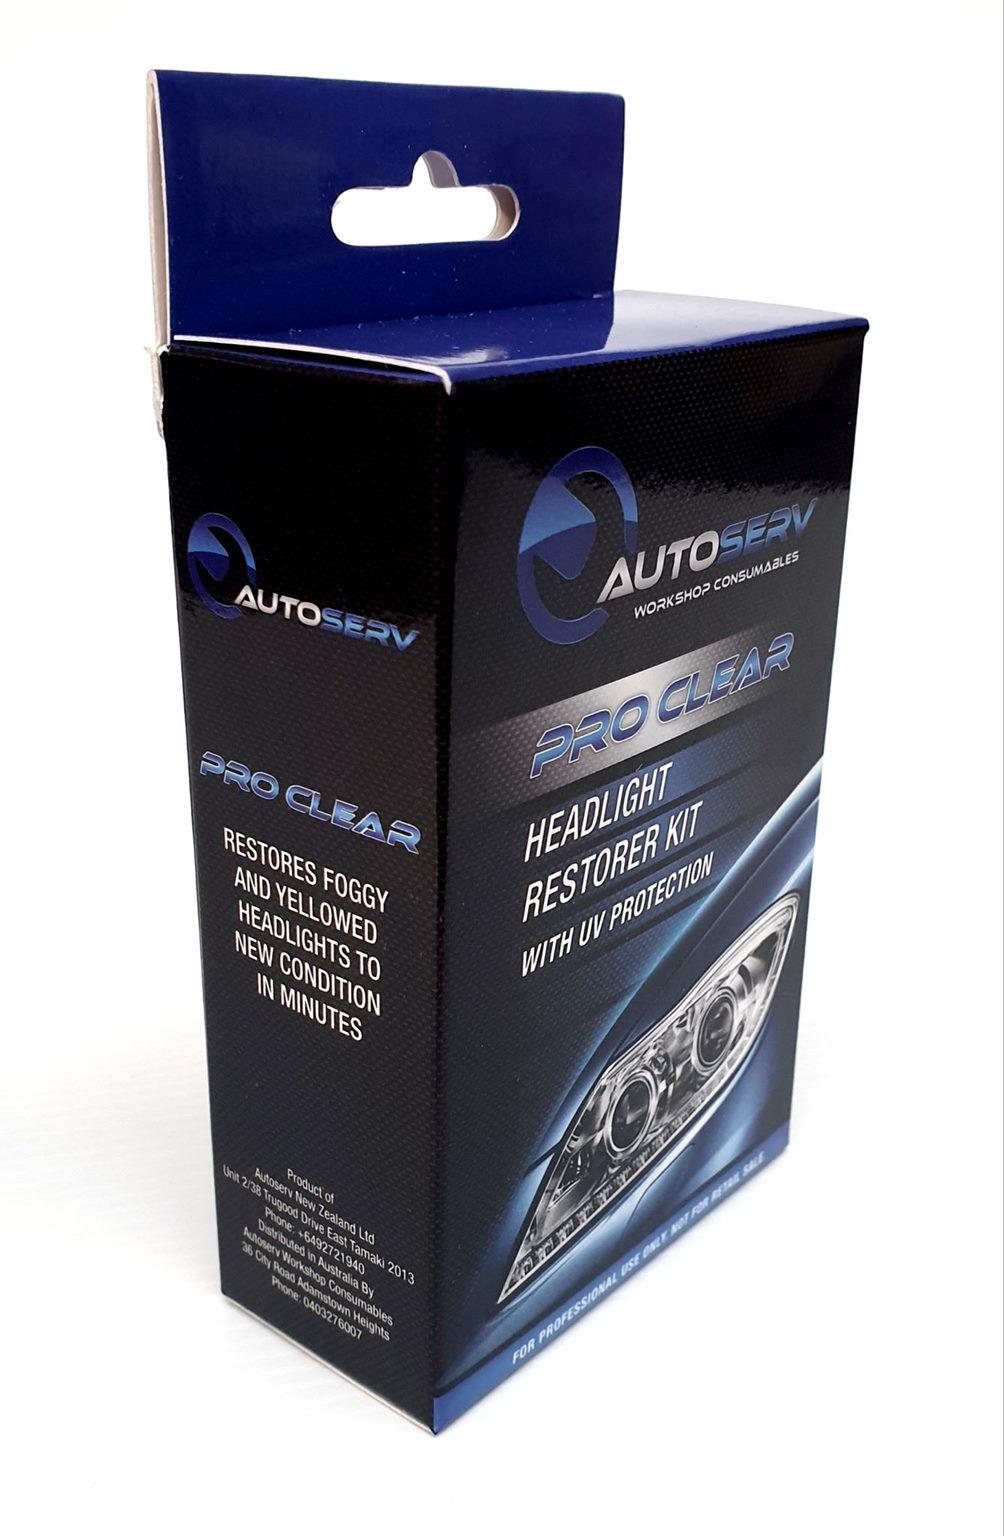 Autoserv Pro Clear Headlight Restoration Kit To Repair Faded